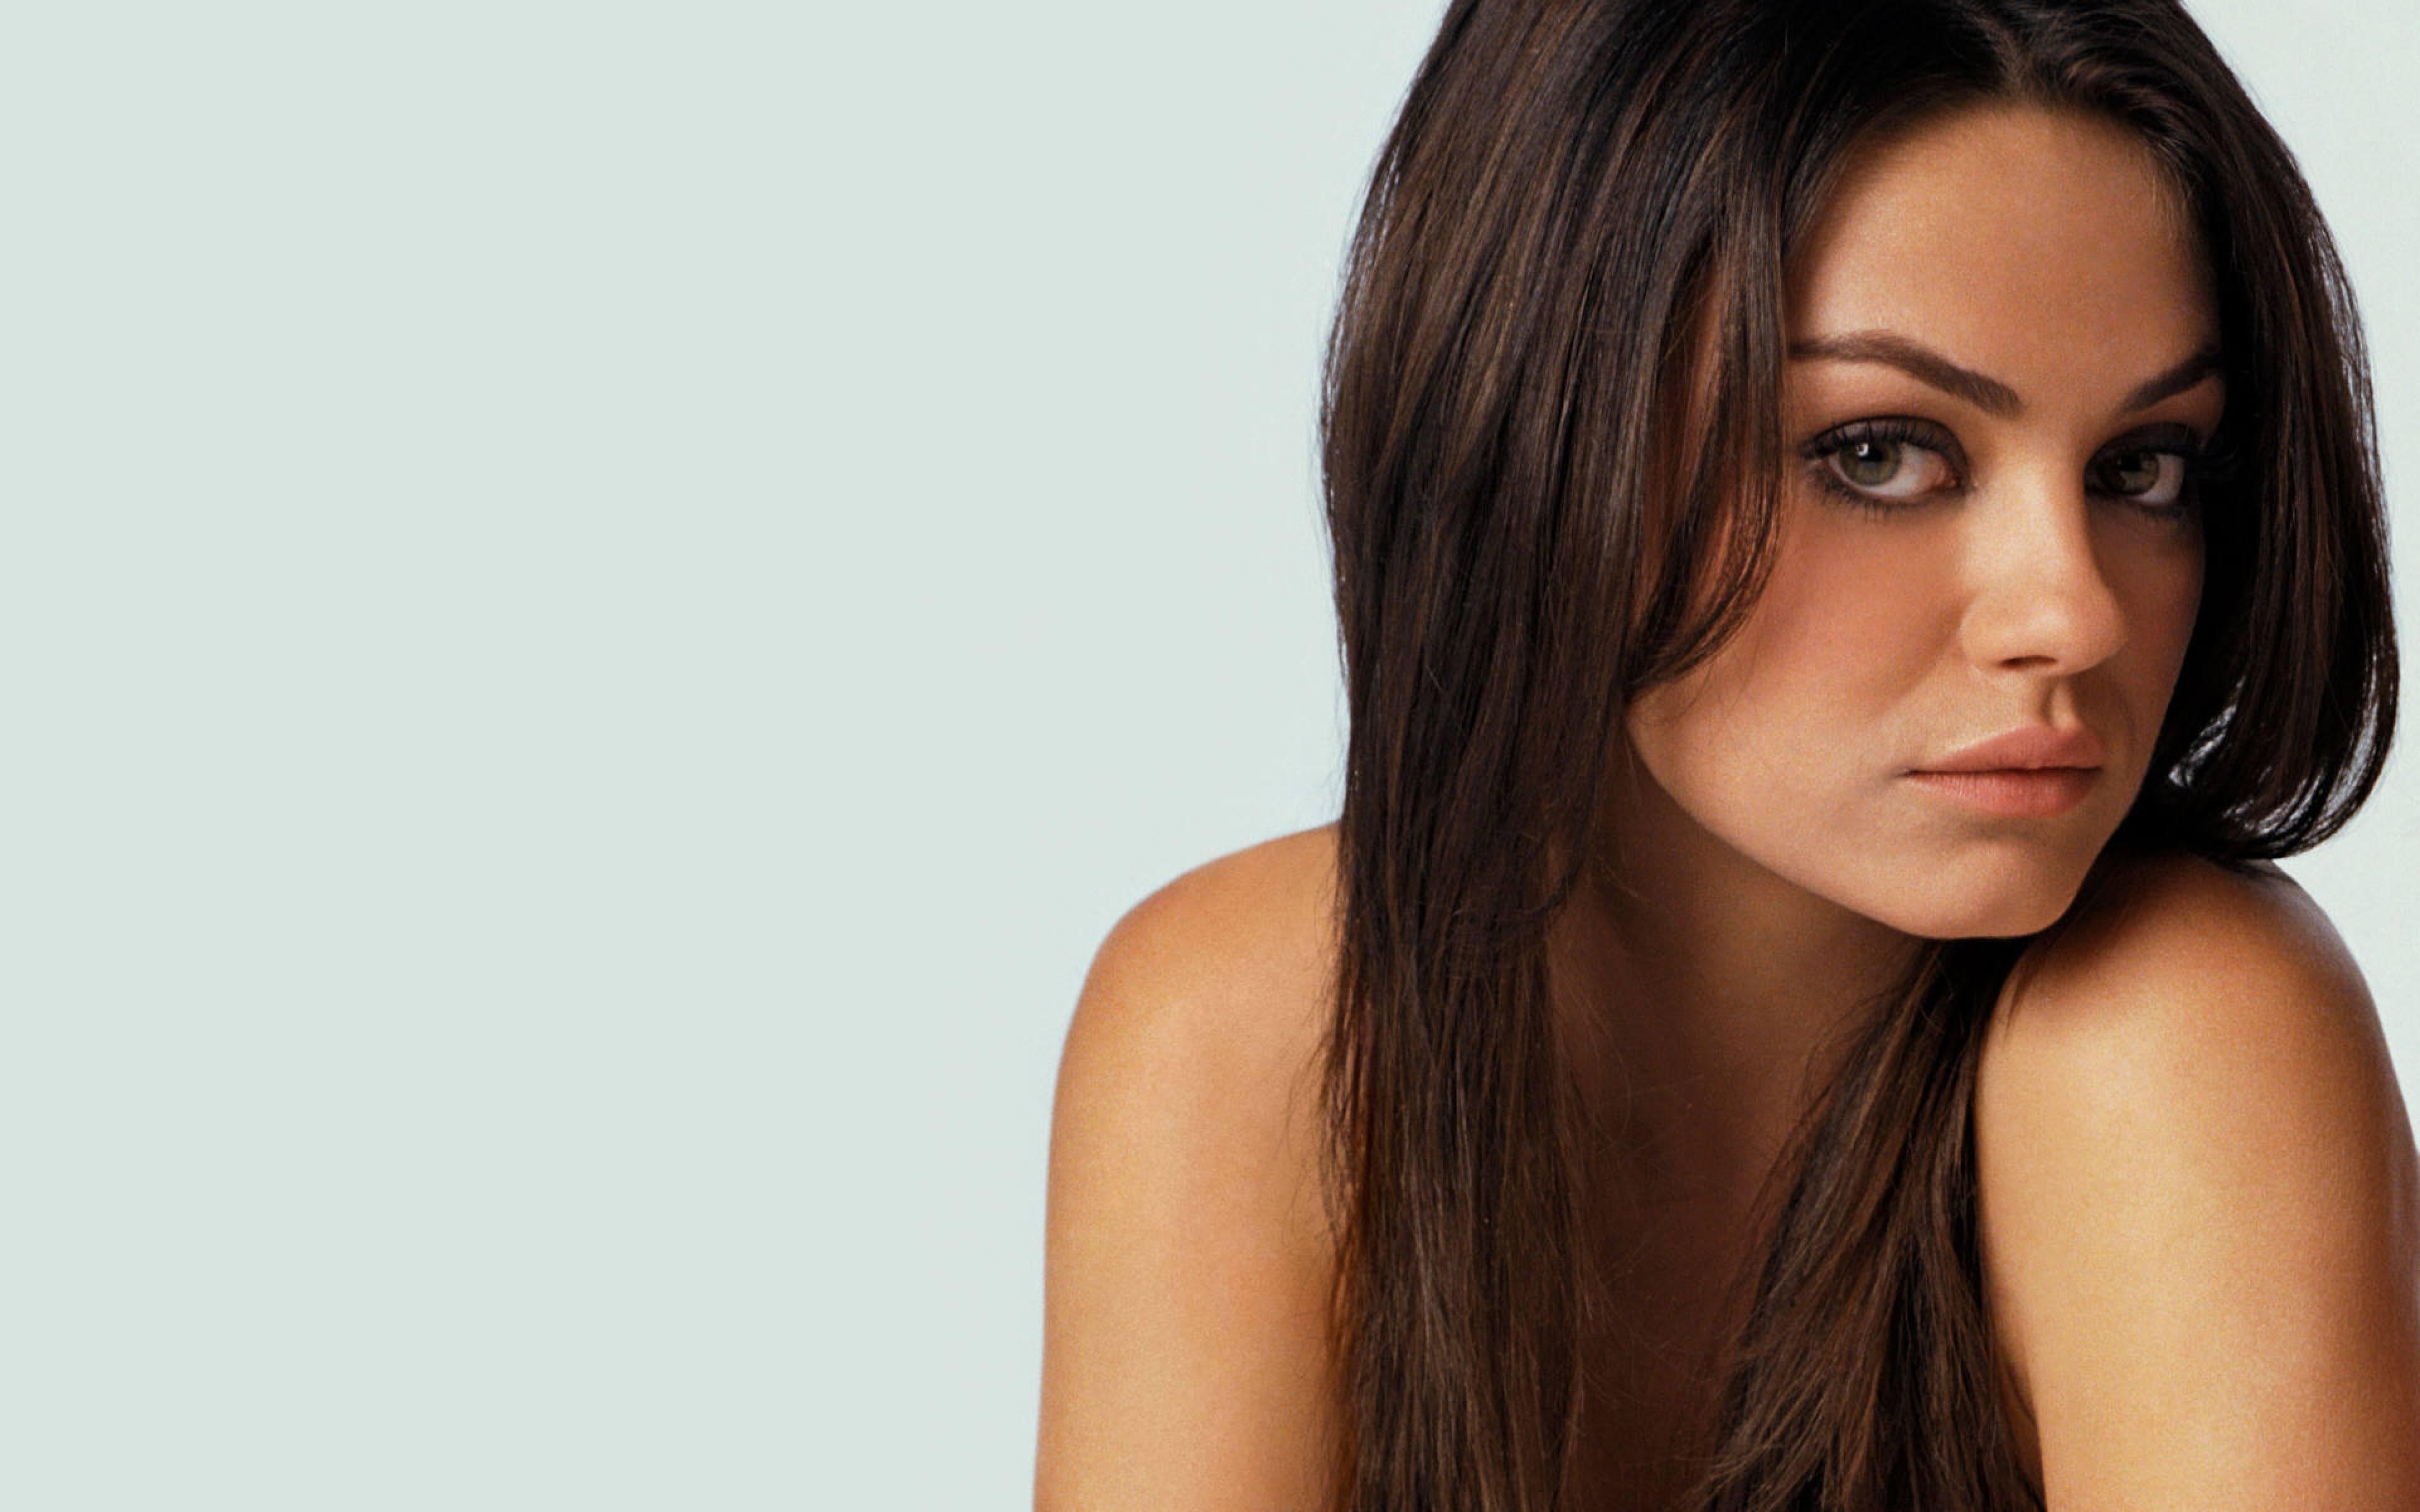 Mila Kunis full hd wallpapers